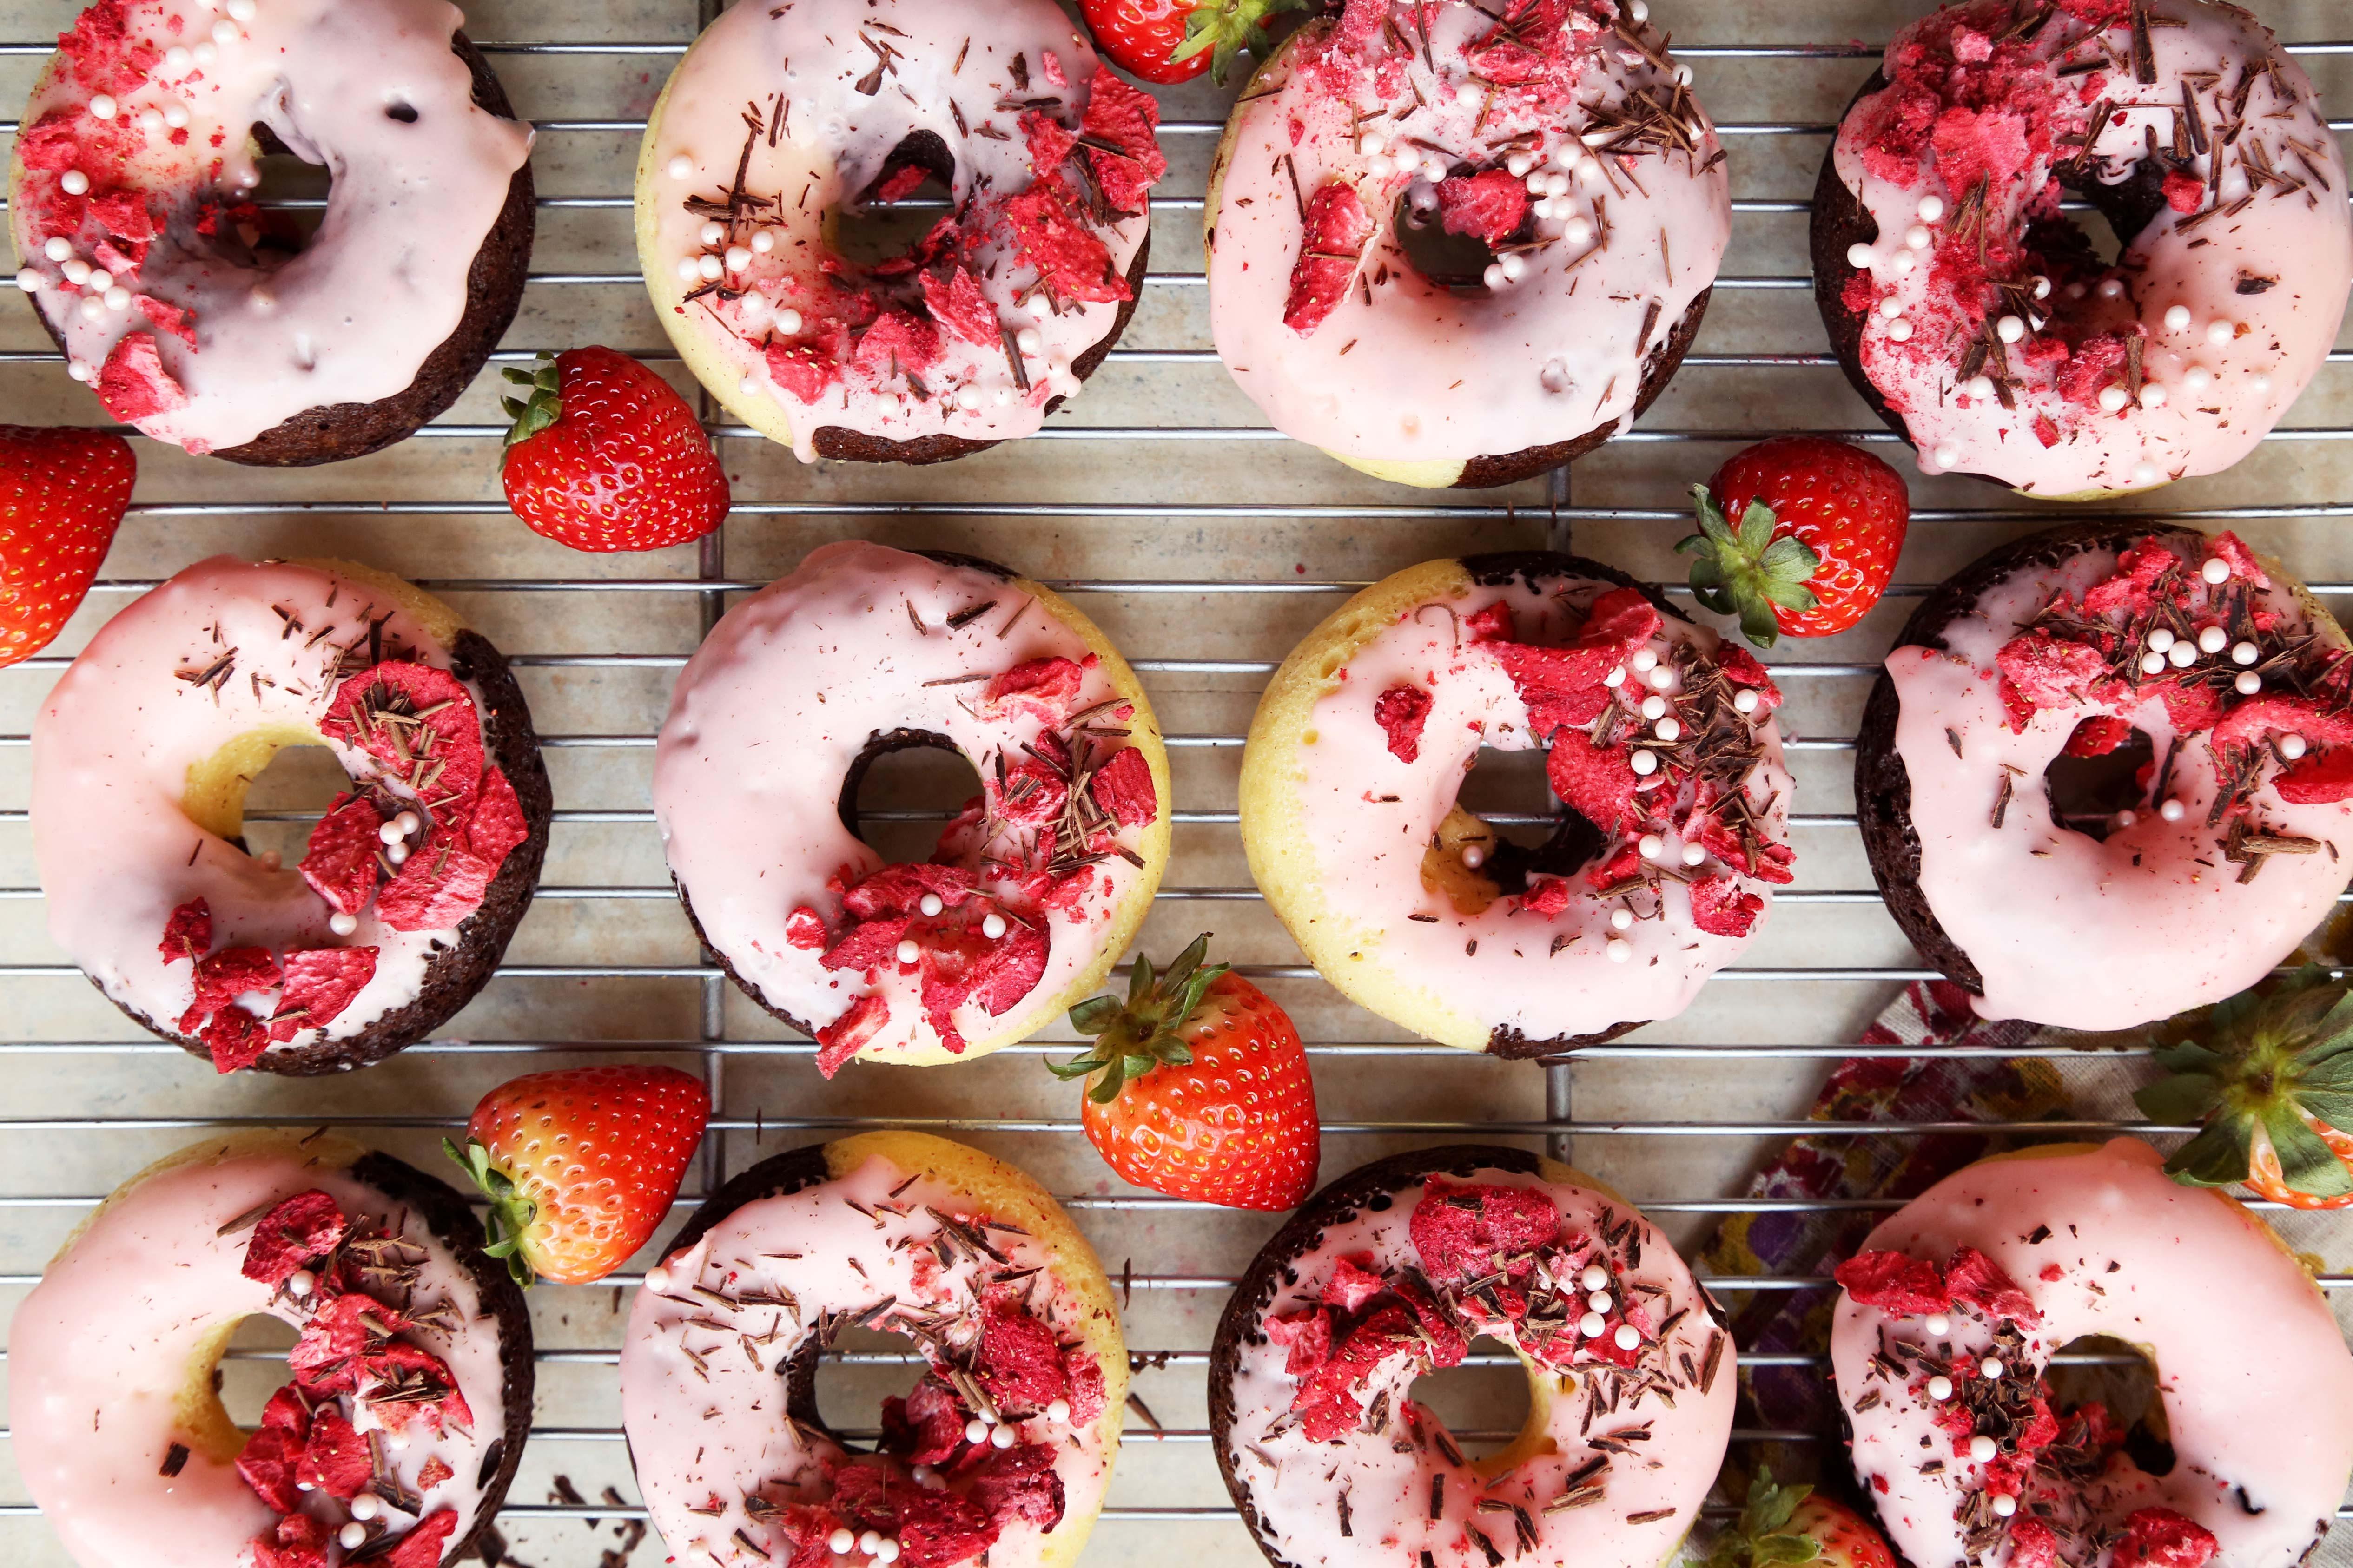 Baked Neapolitan Doughnuts